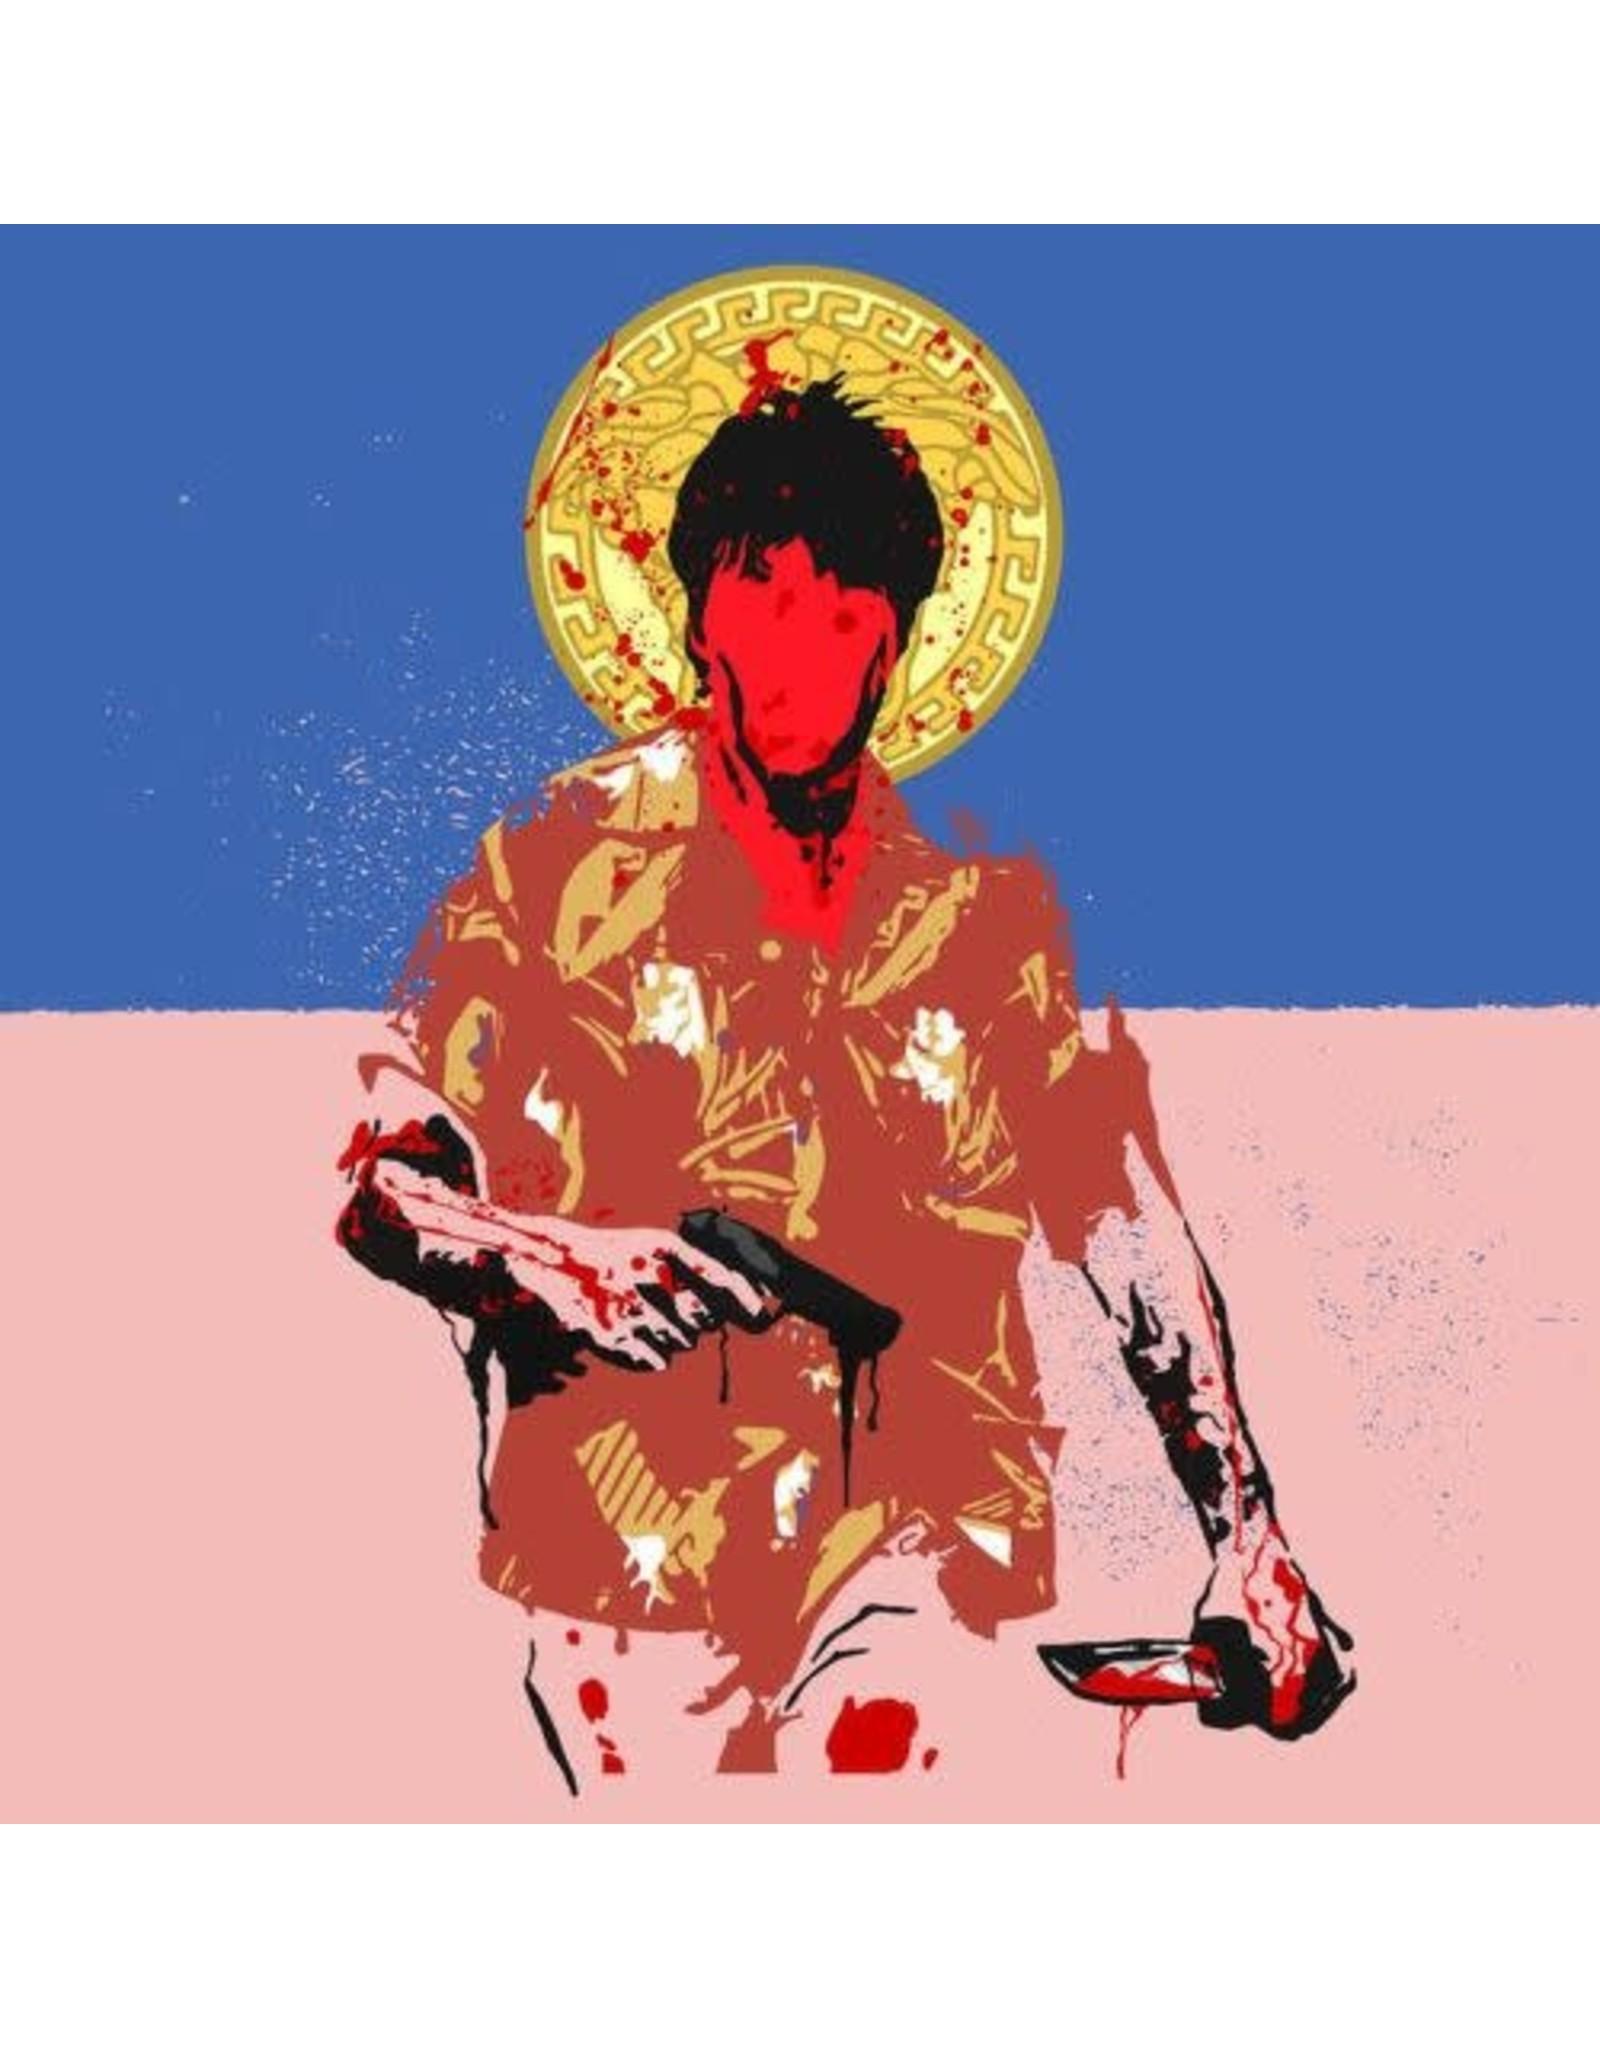 38 Spesh & Benny - Stabbed & Shot LP